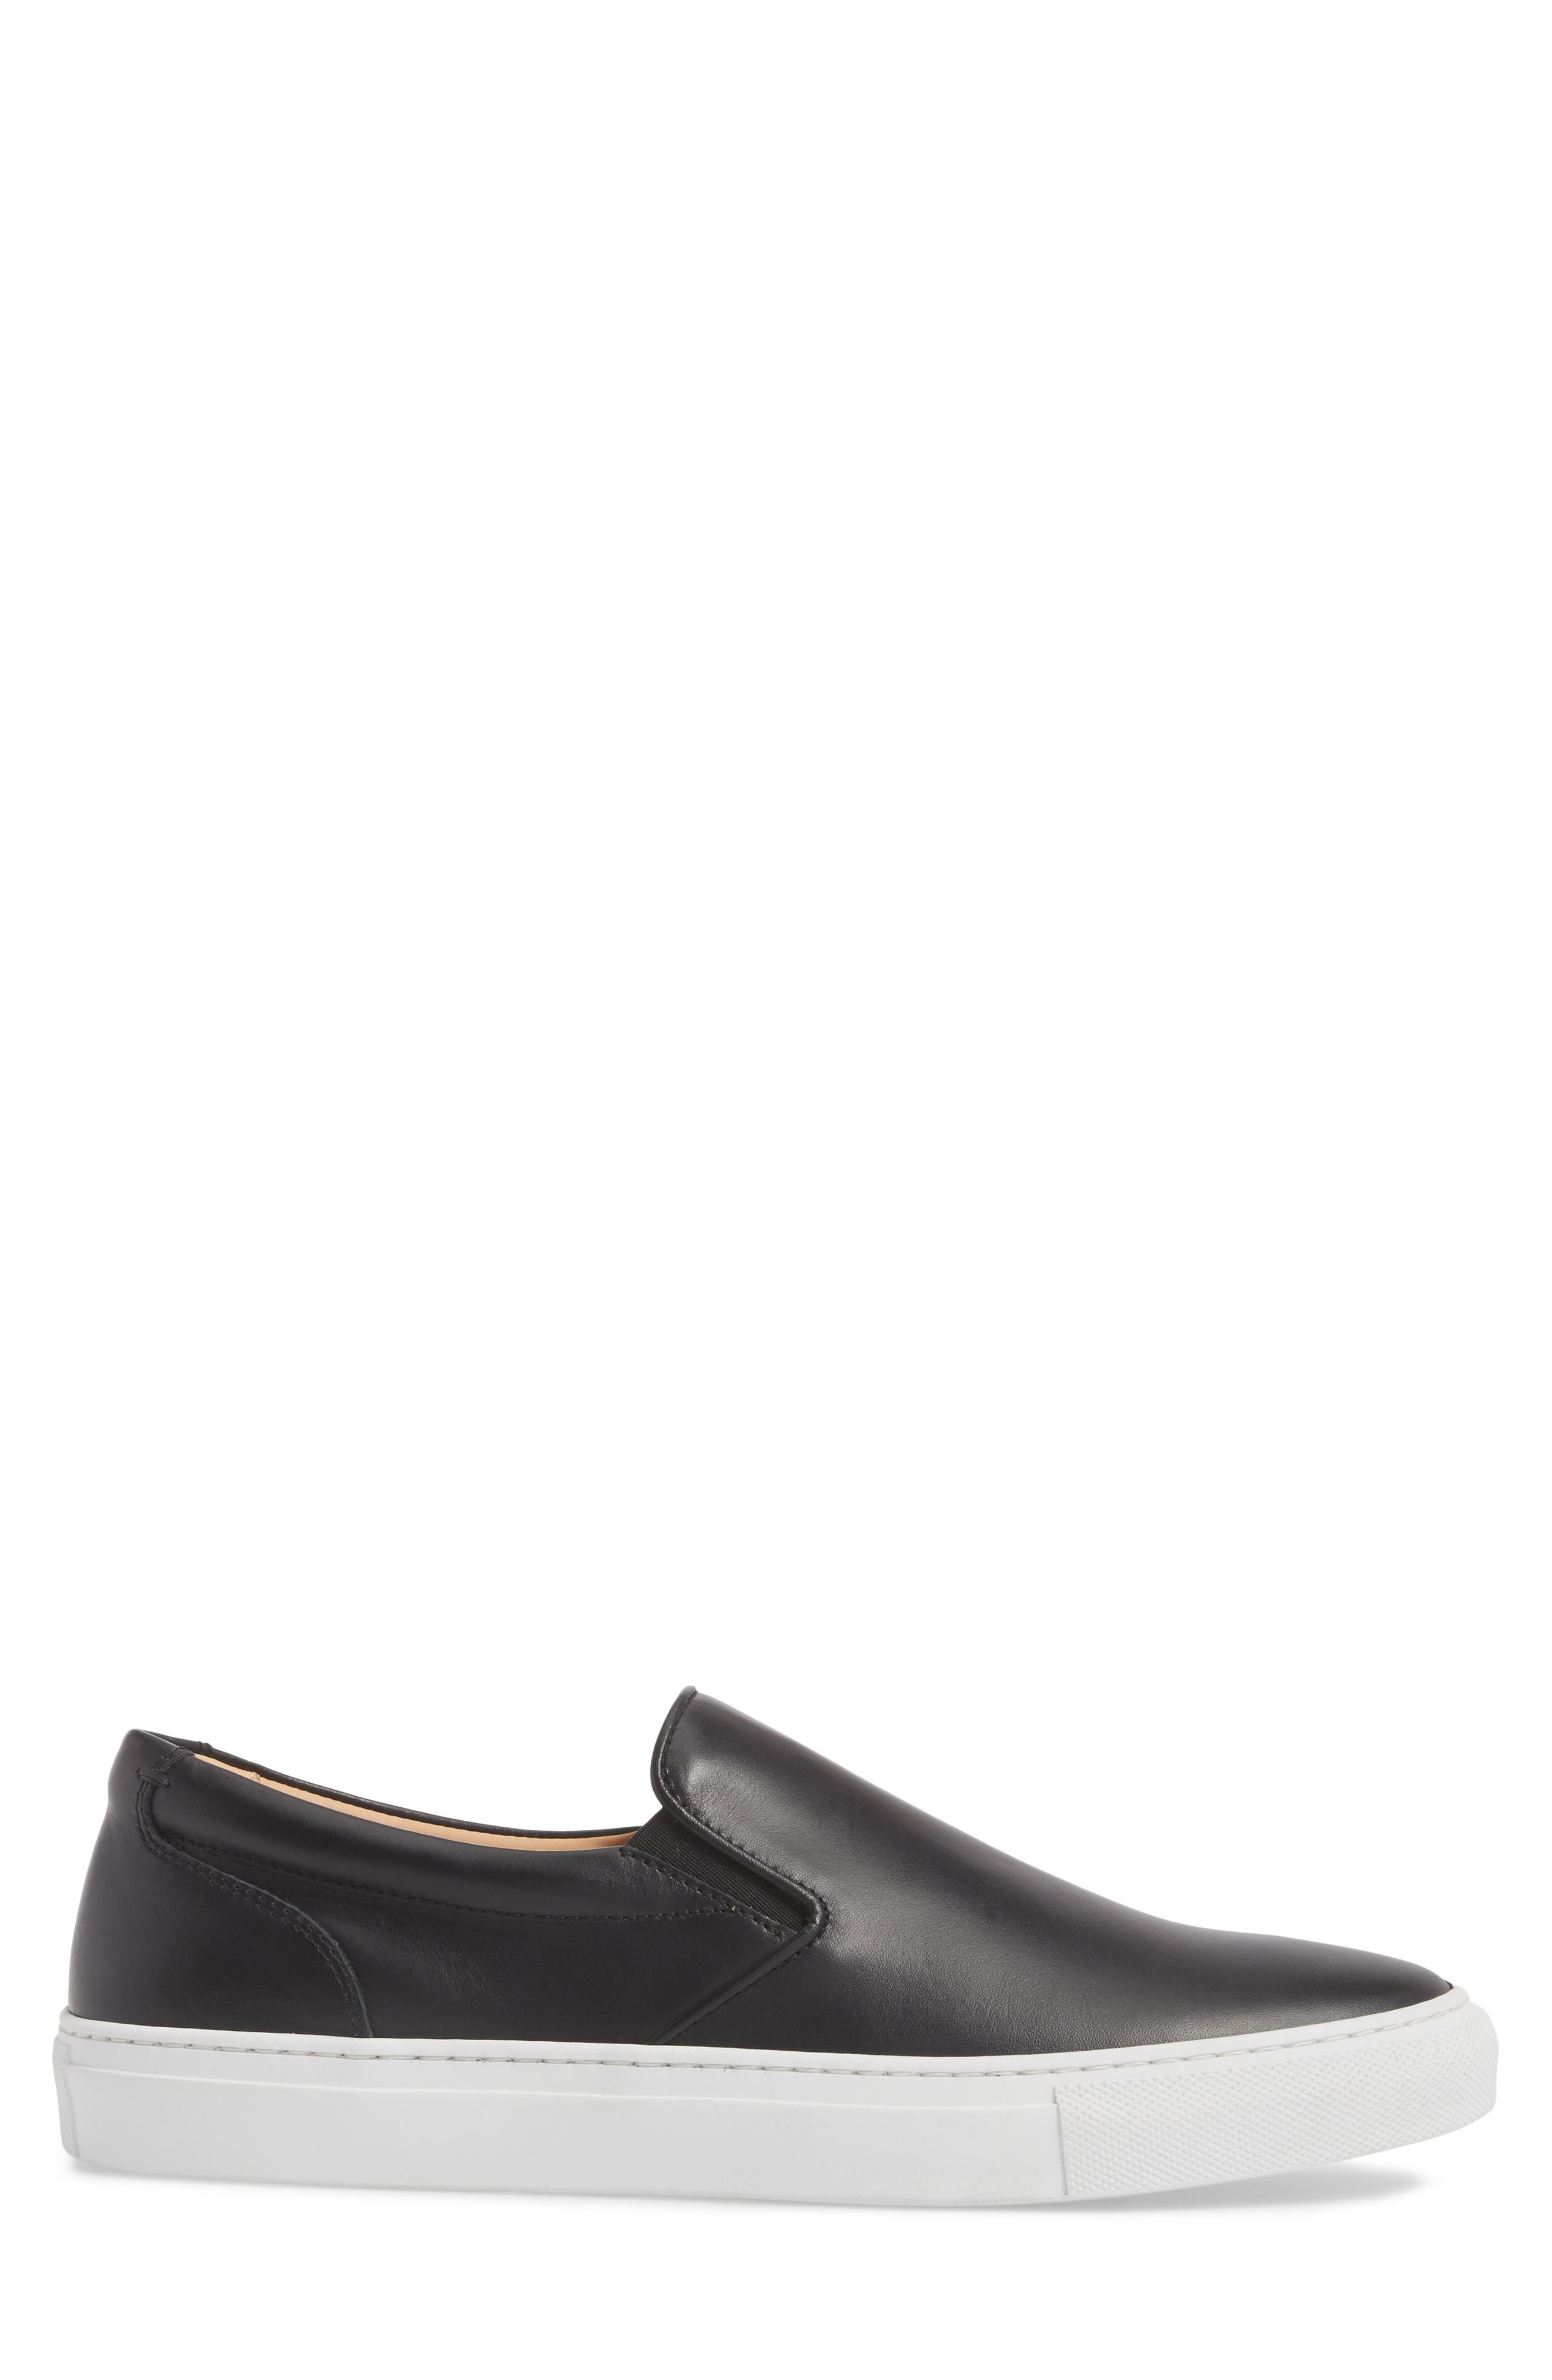 Wooster Slip-On Sneaker,                             Alternate thumbnail 3, color,                             Black Leather